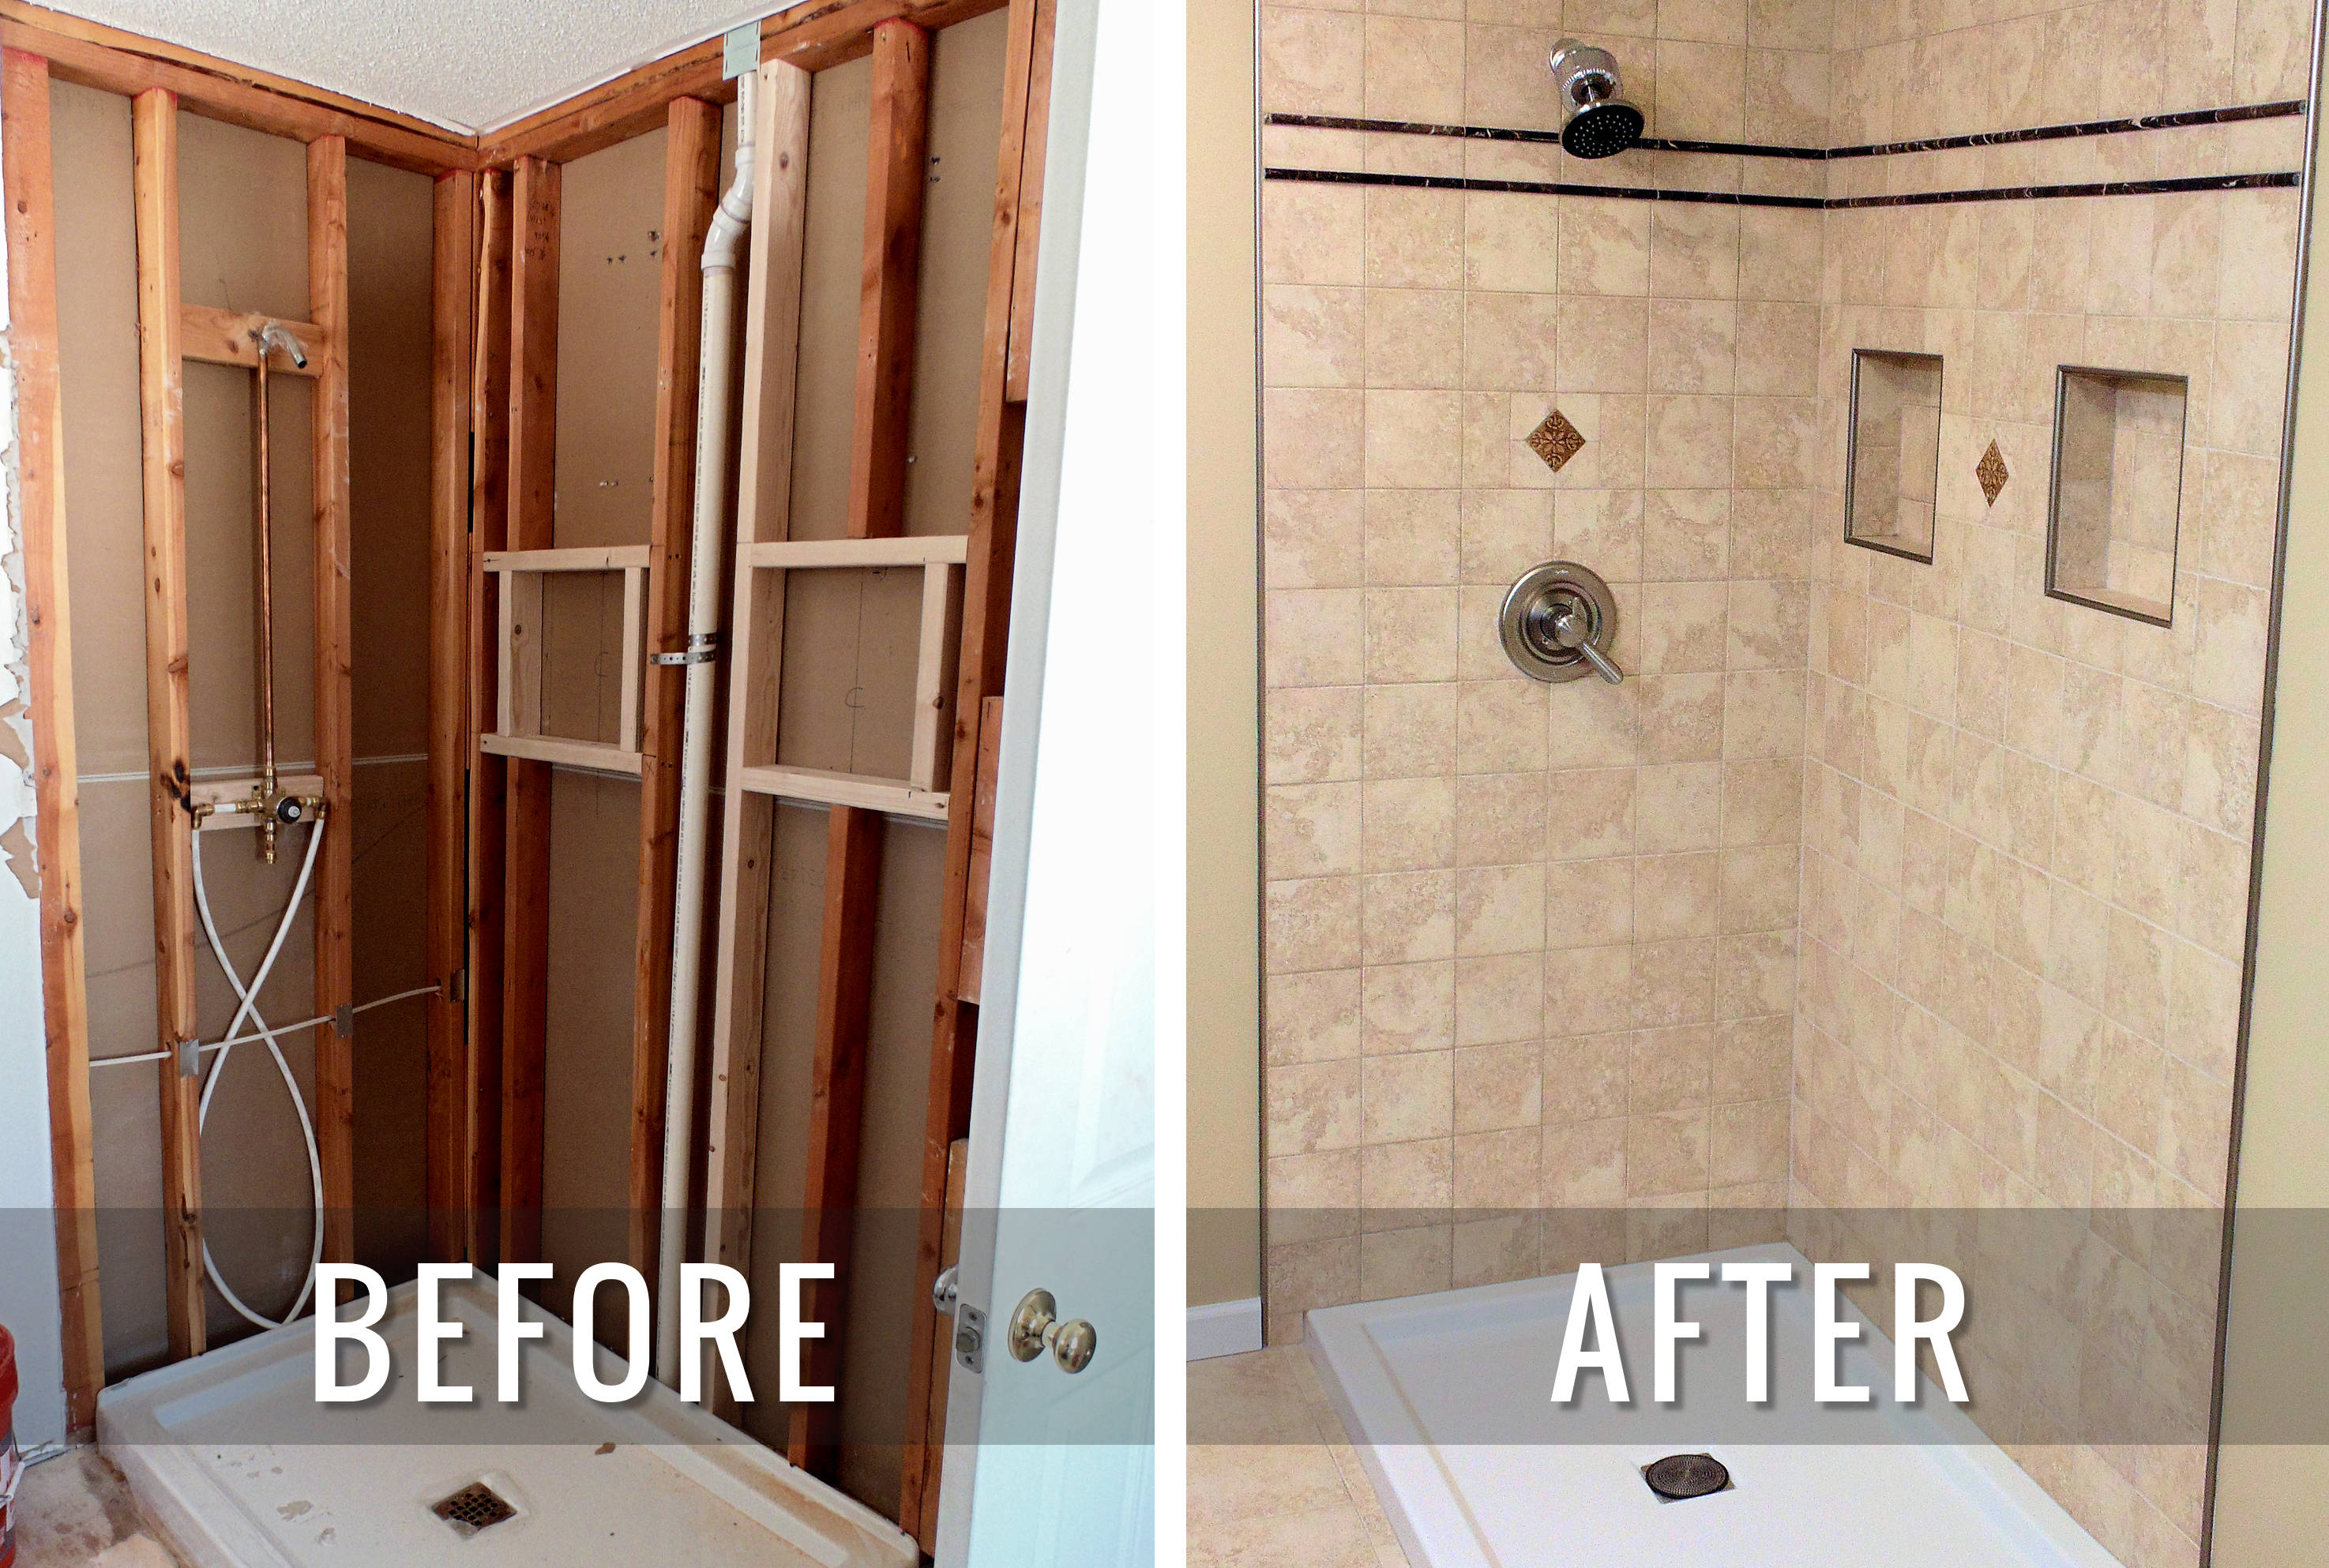 Hartford Connecticut Home Improvement Company — Bathroom Renovation